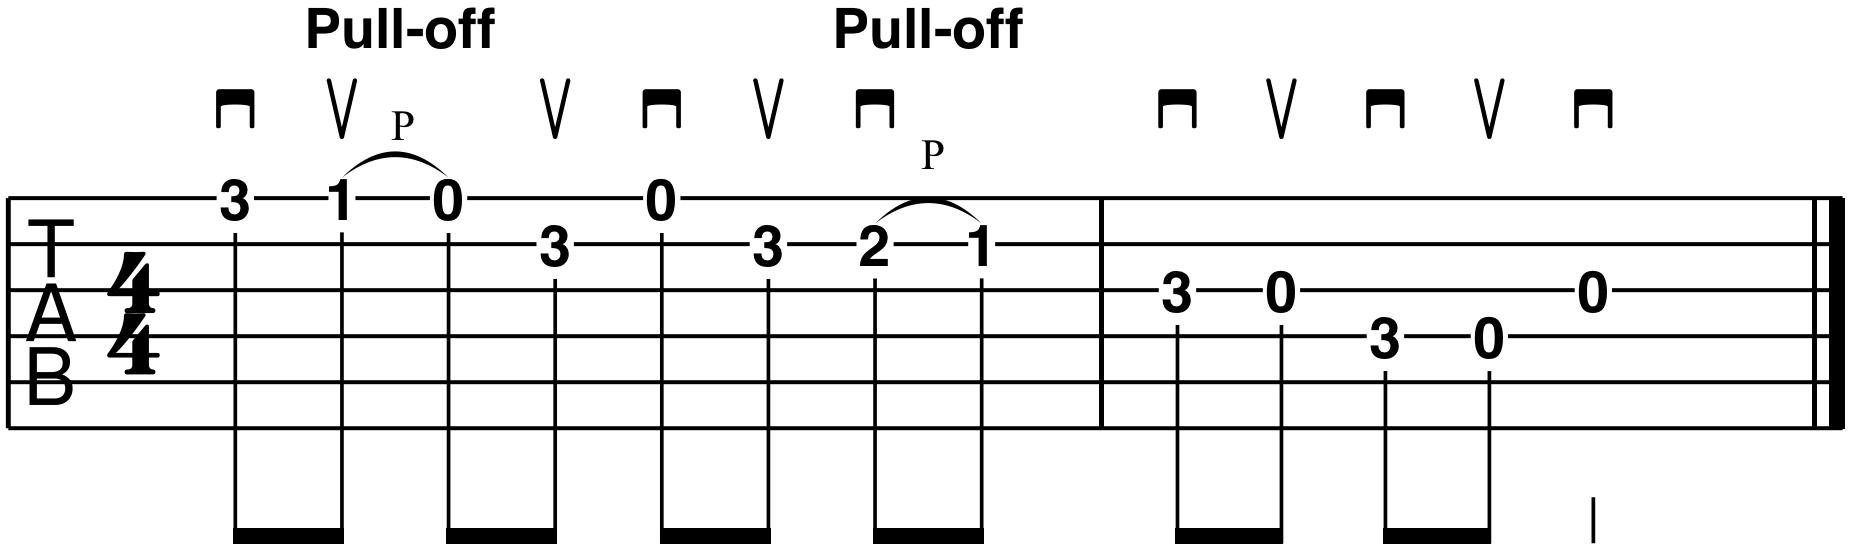 guitar tablature pull offs